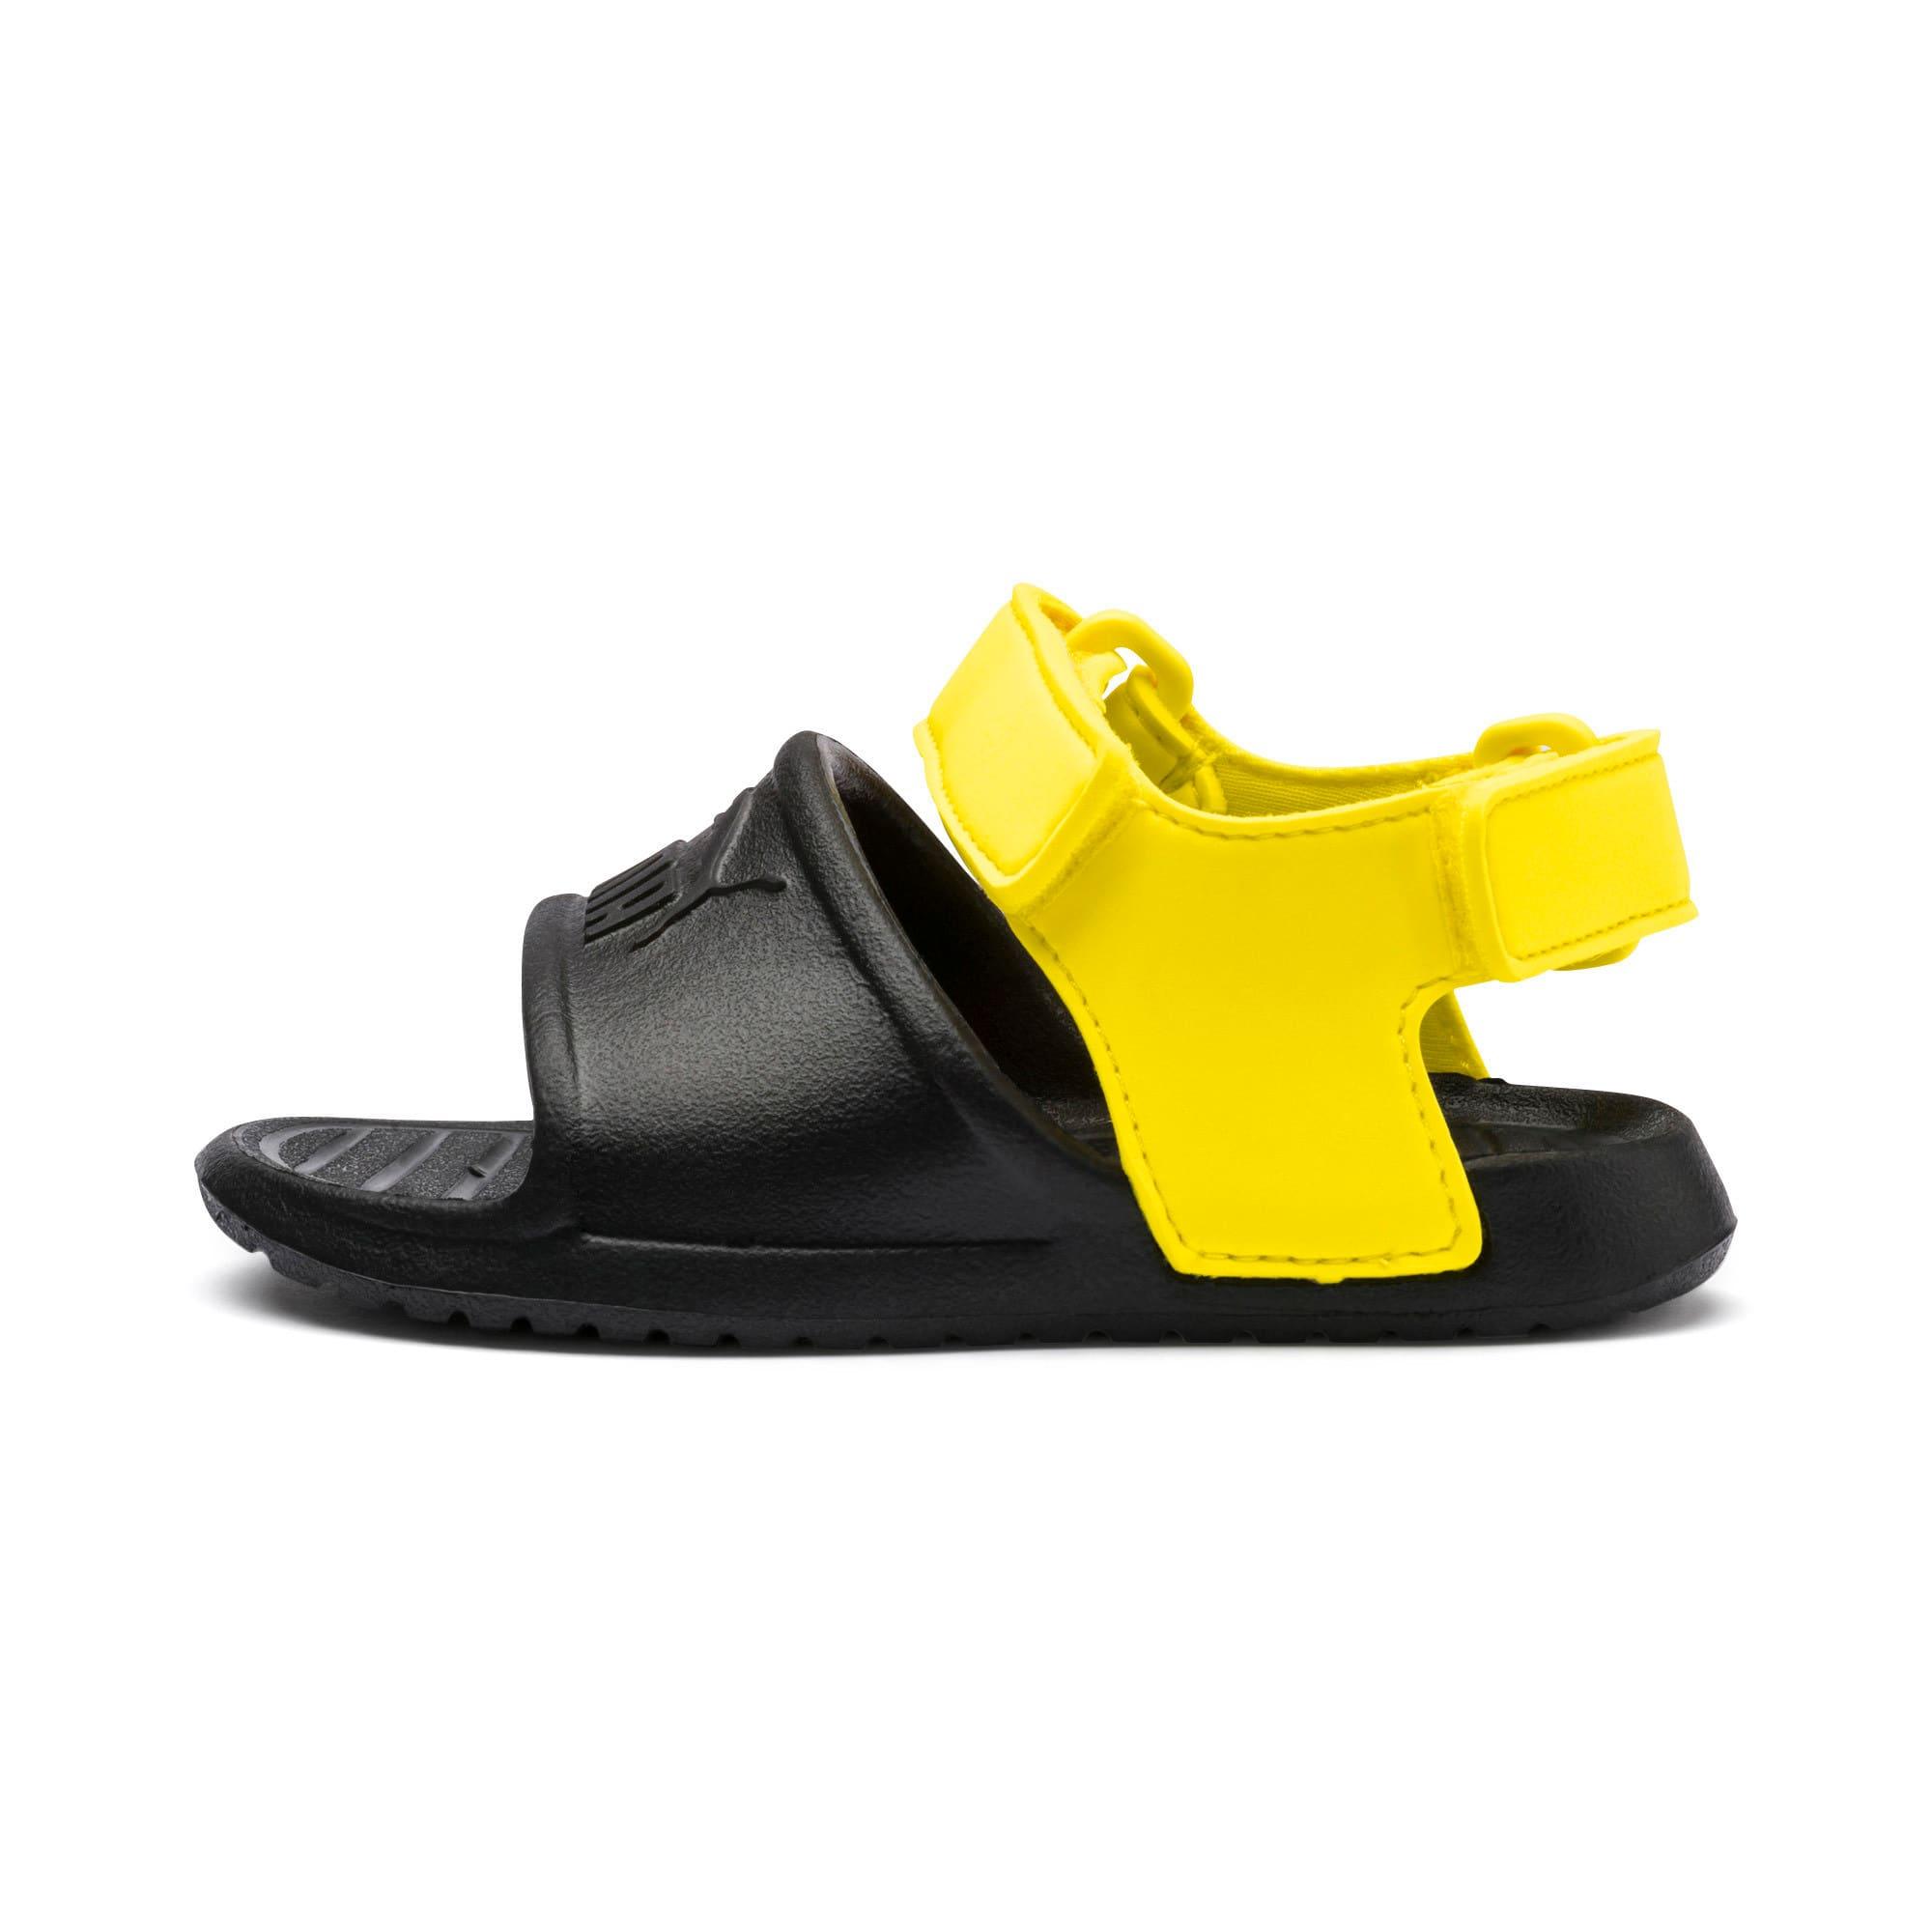 Divecat v2 Injex Kids? Sandals, Geel/Zwart, Maat 34.5   PUMA